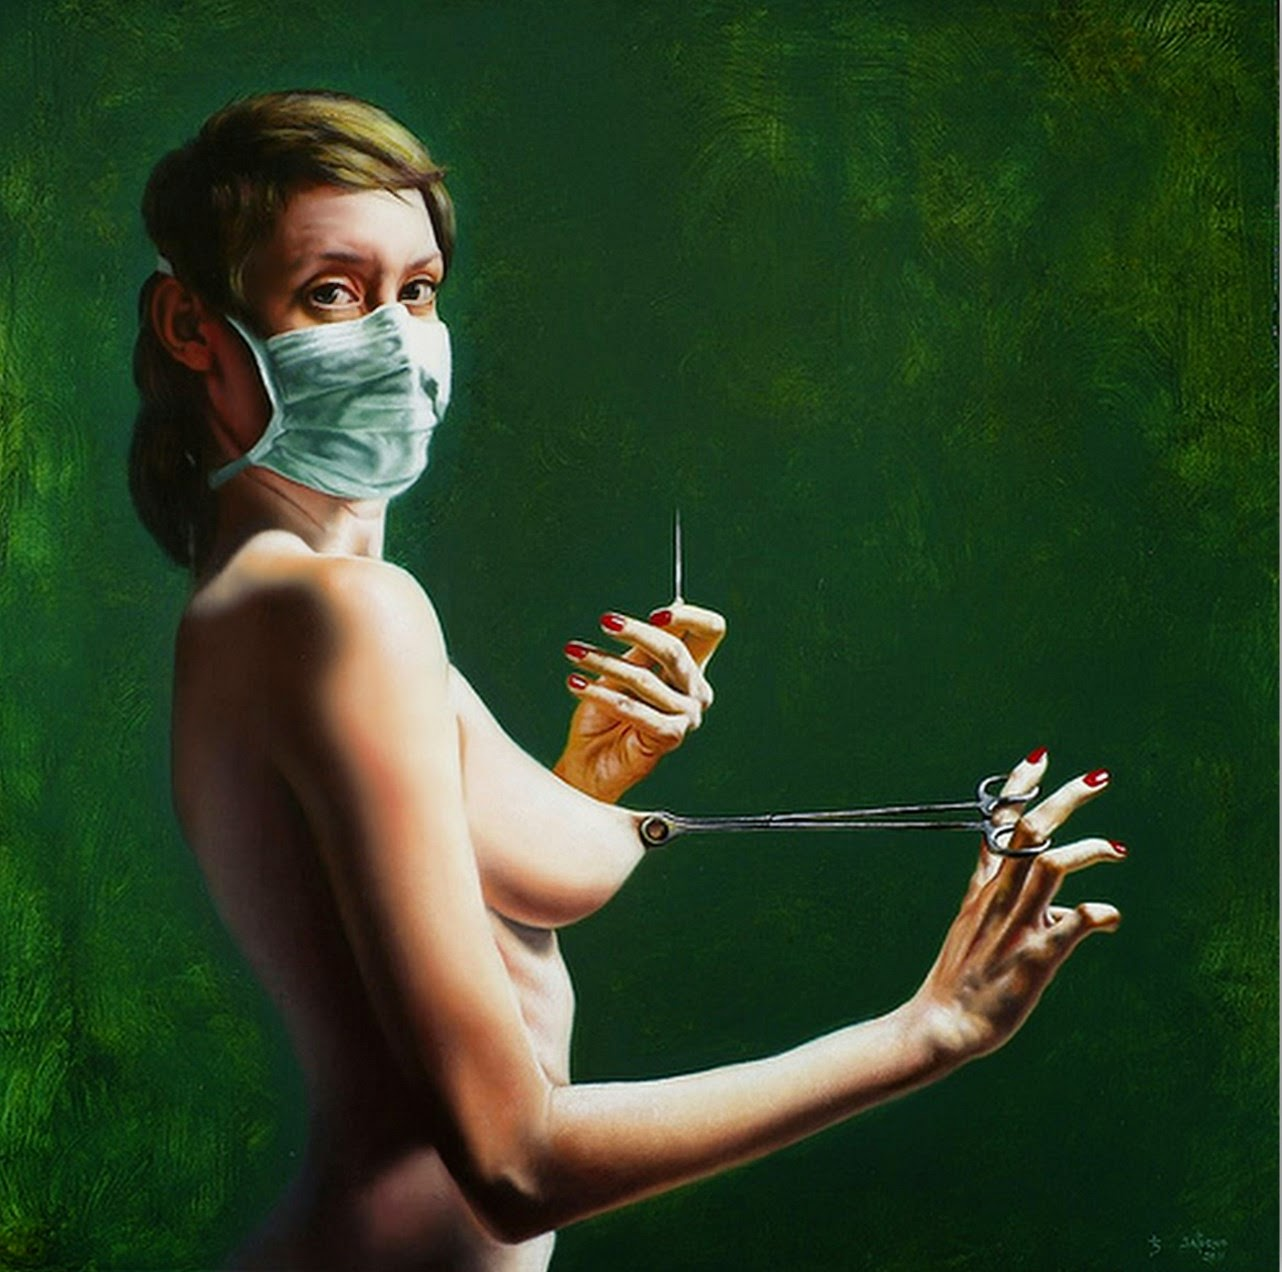 pinturas-al-oleo-surrealismo